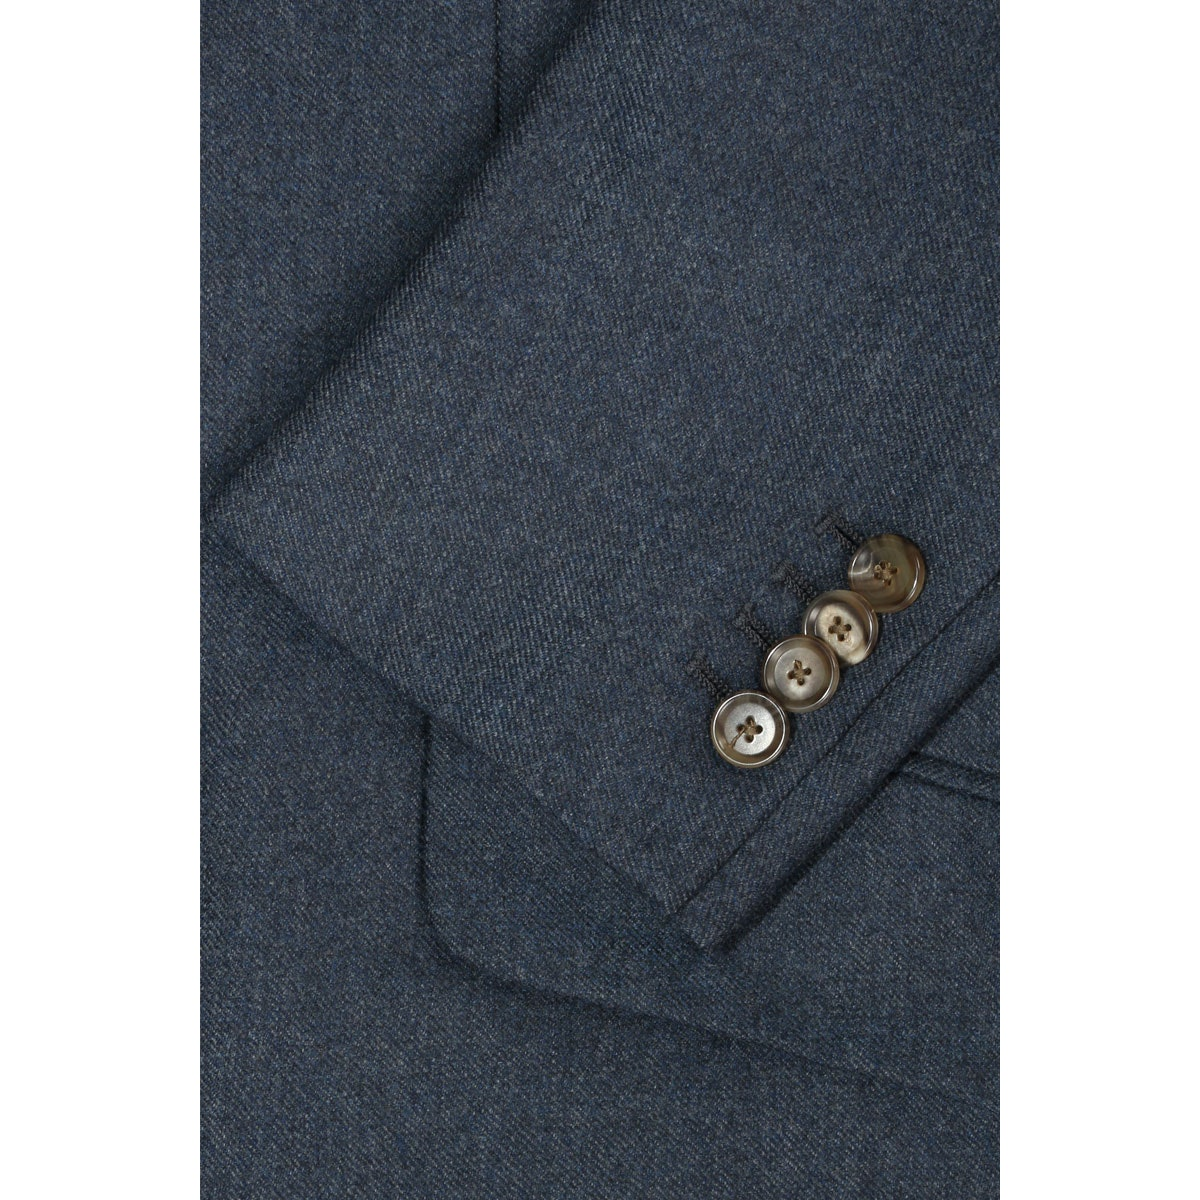 InStitchu Deep Blue Overcoat Sleeve Detail